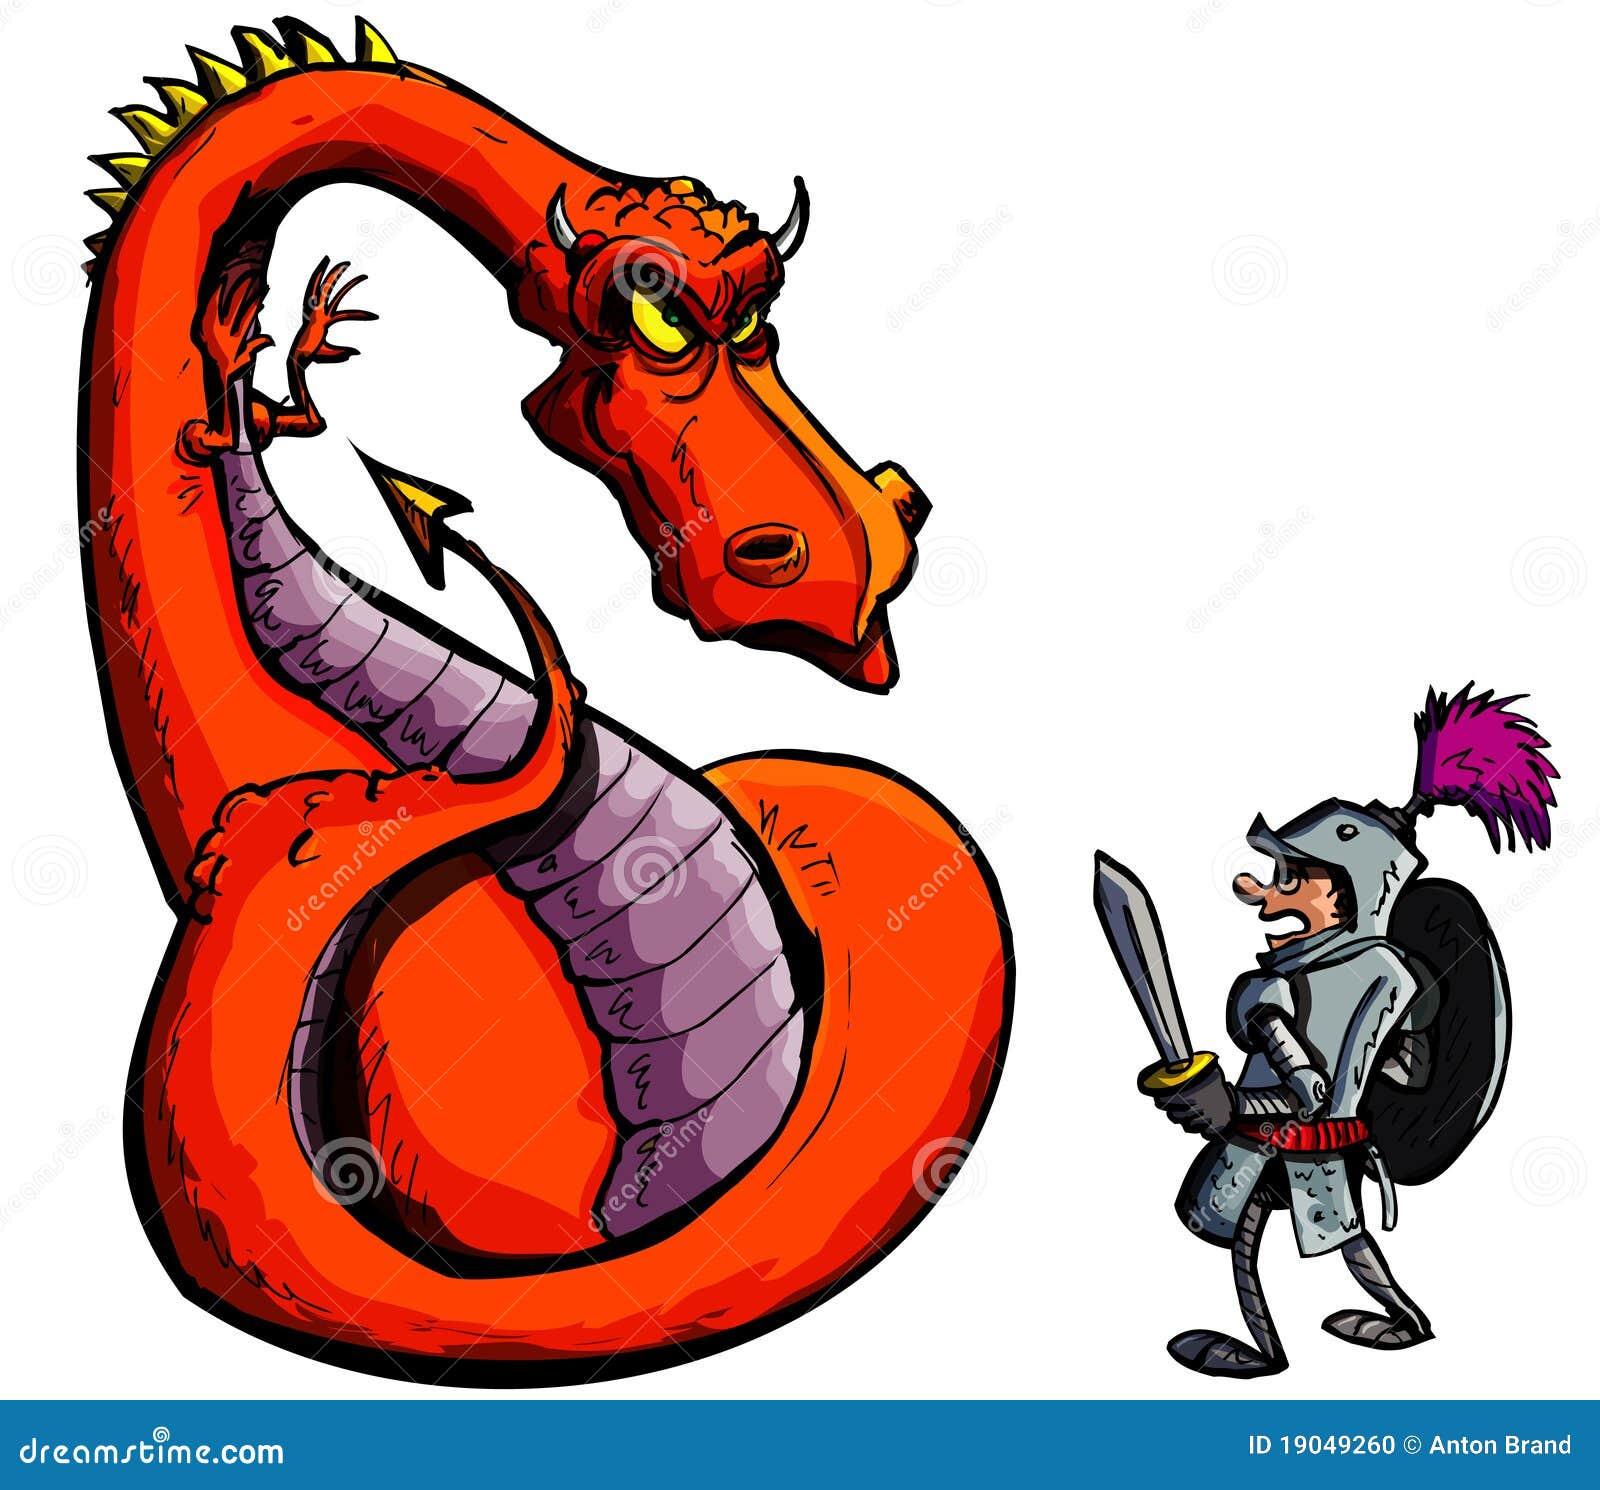 dessin anim d 39 un chevalier faisant face un dragon f roce photo stock image 19049260. Black Bedroom Furniture Sets. Home Design Ideas